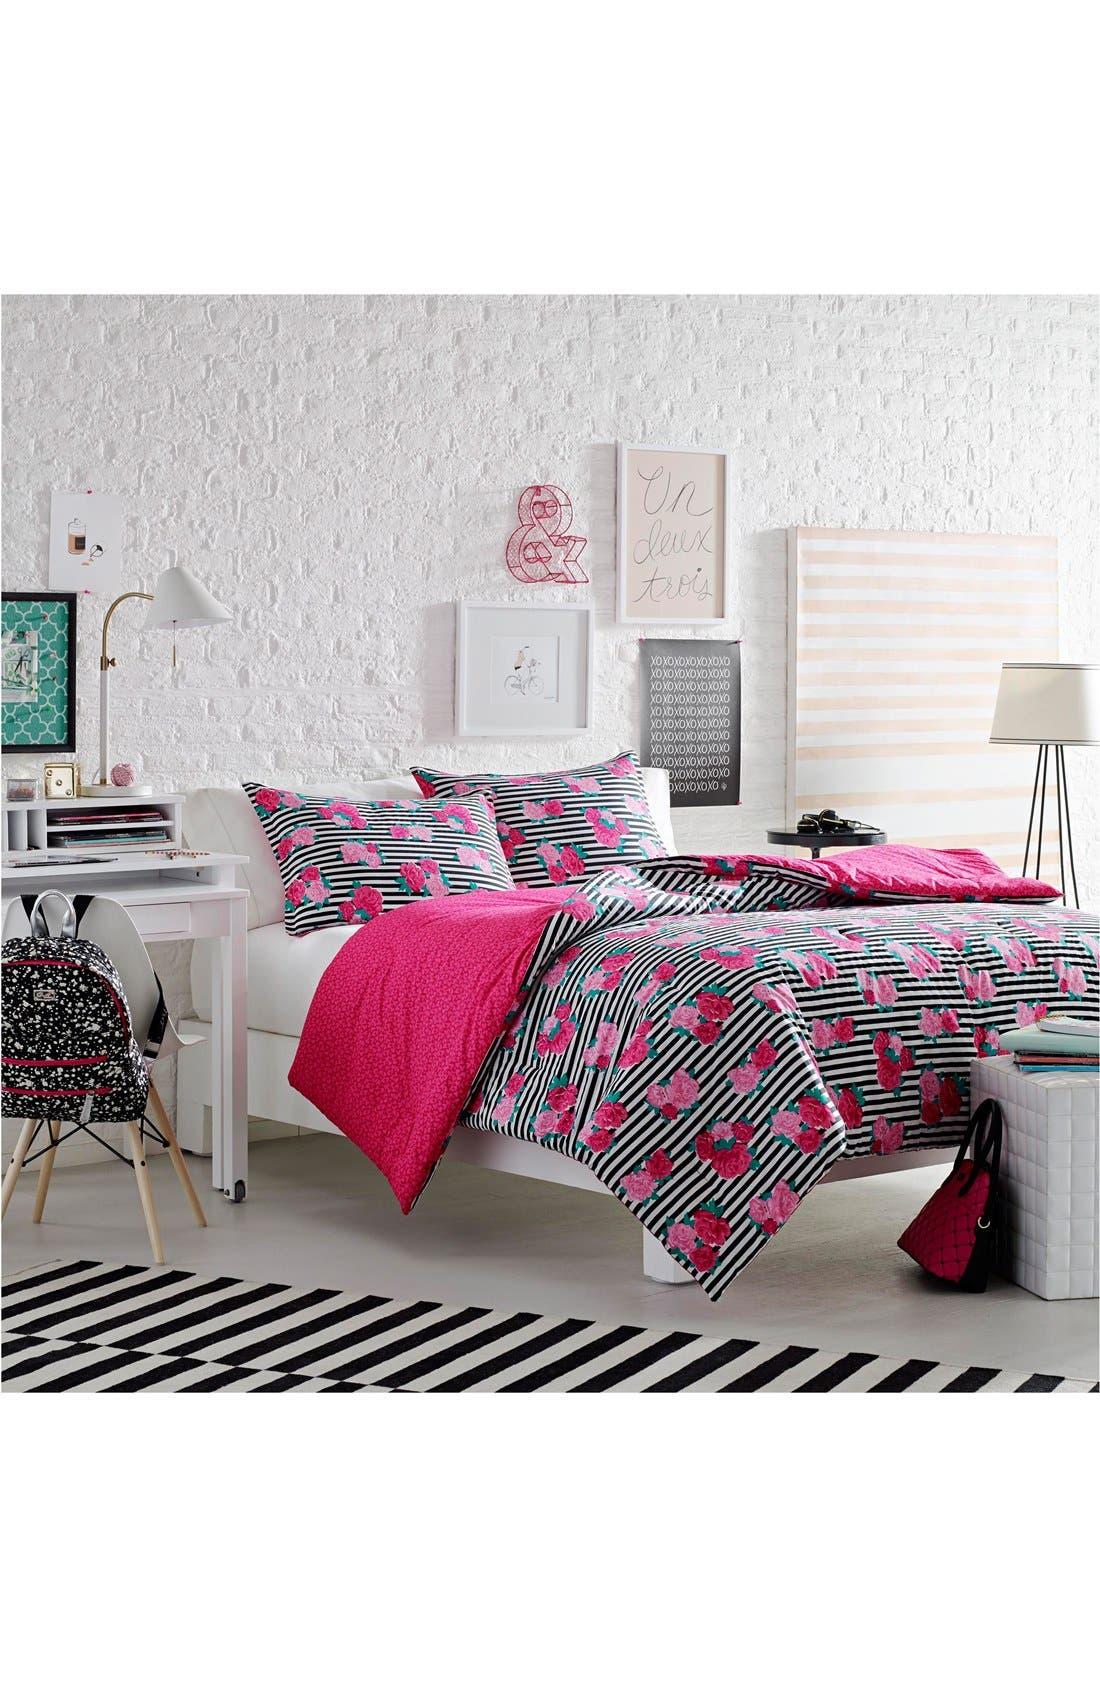 Main Image - Betsey Johnson Bedding Royal Roses Comforter & Sham Set